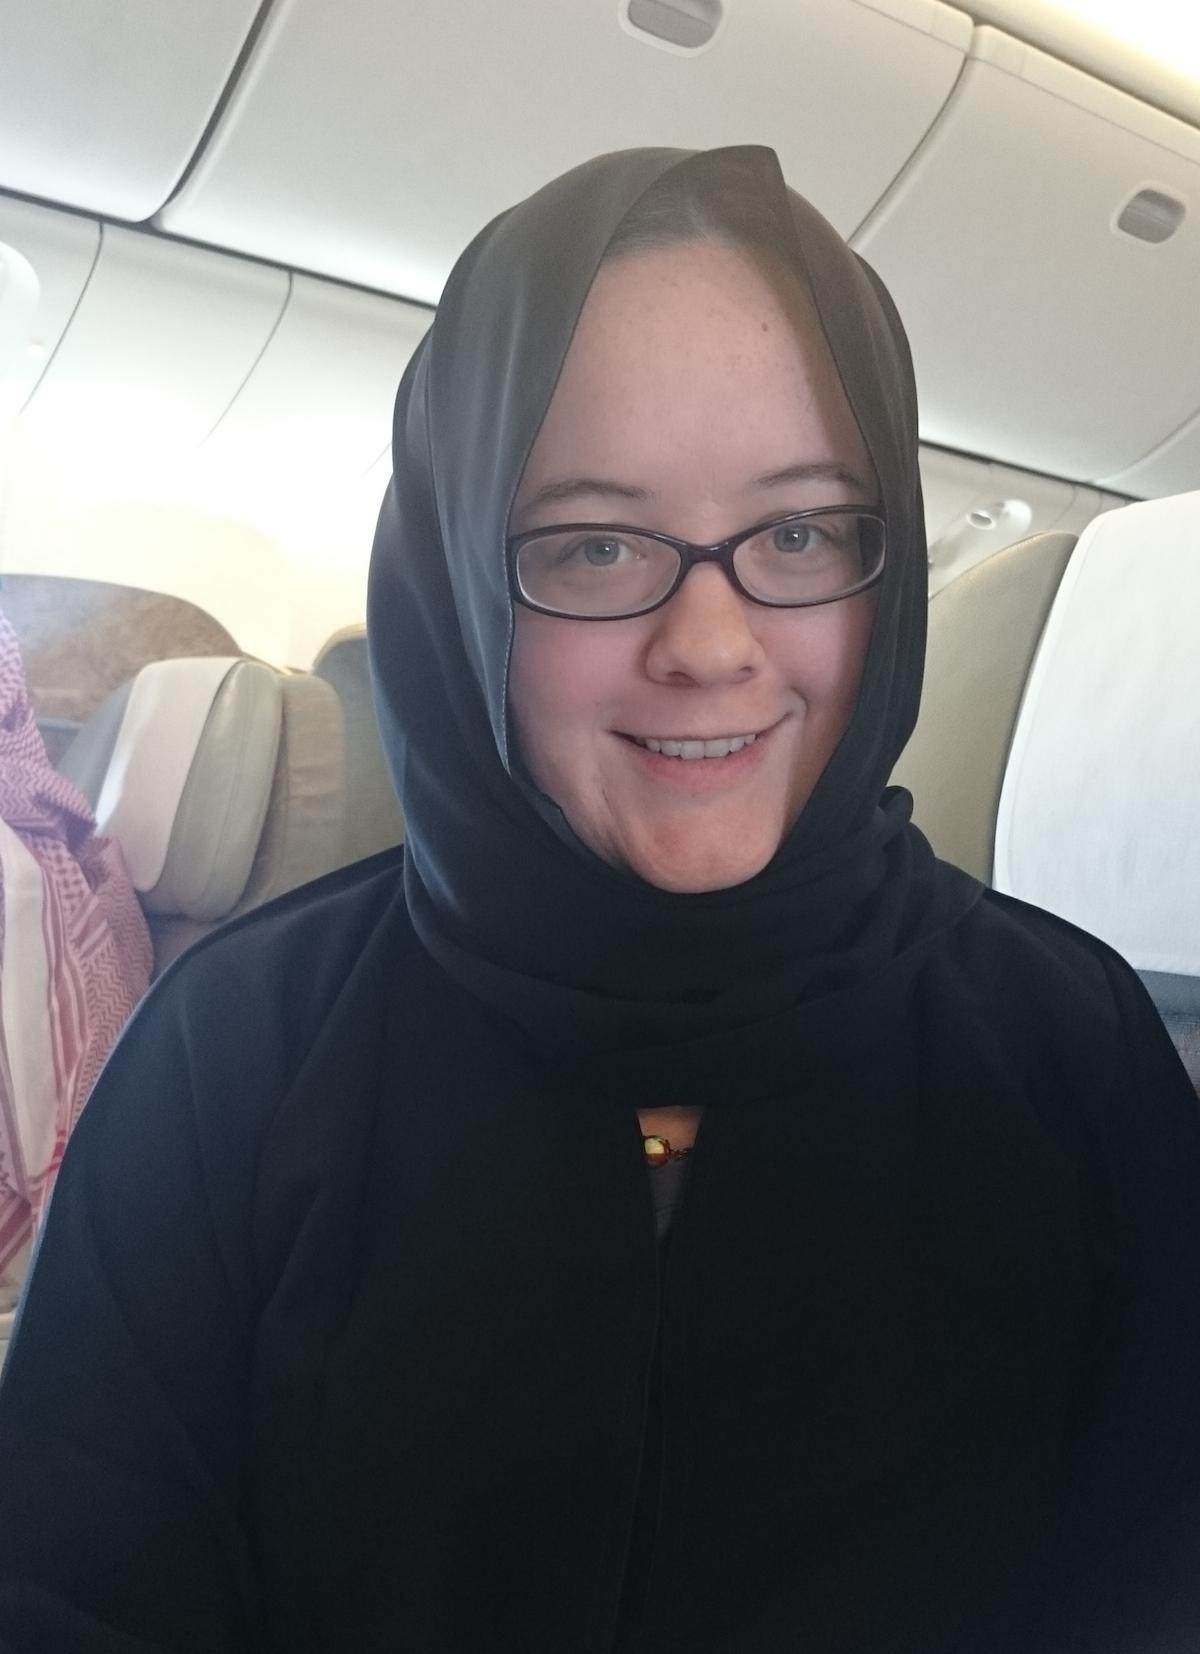 A Week Working in Saudi Arabia as a Woman